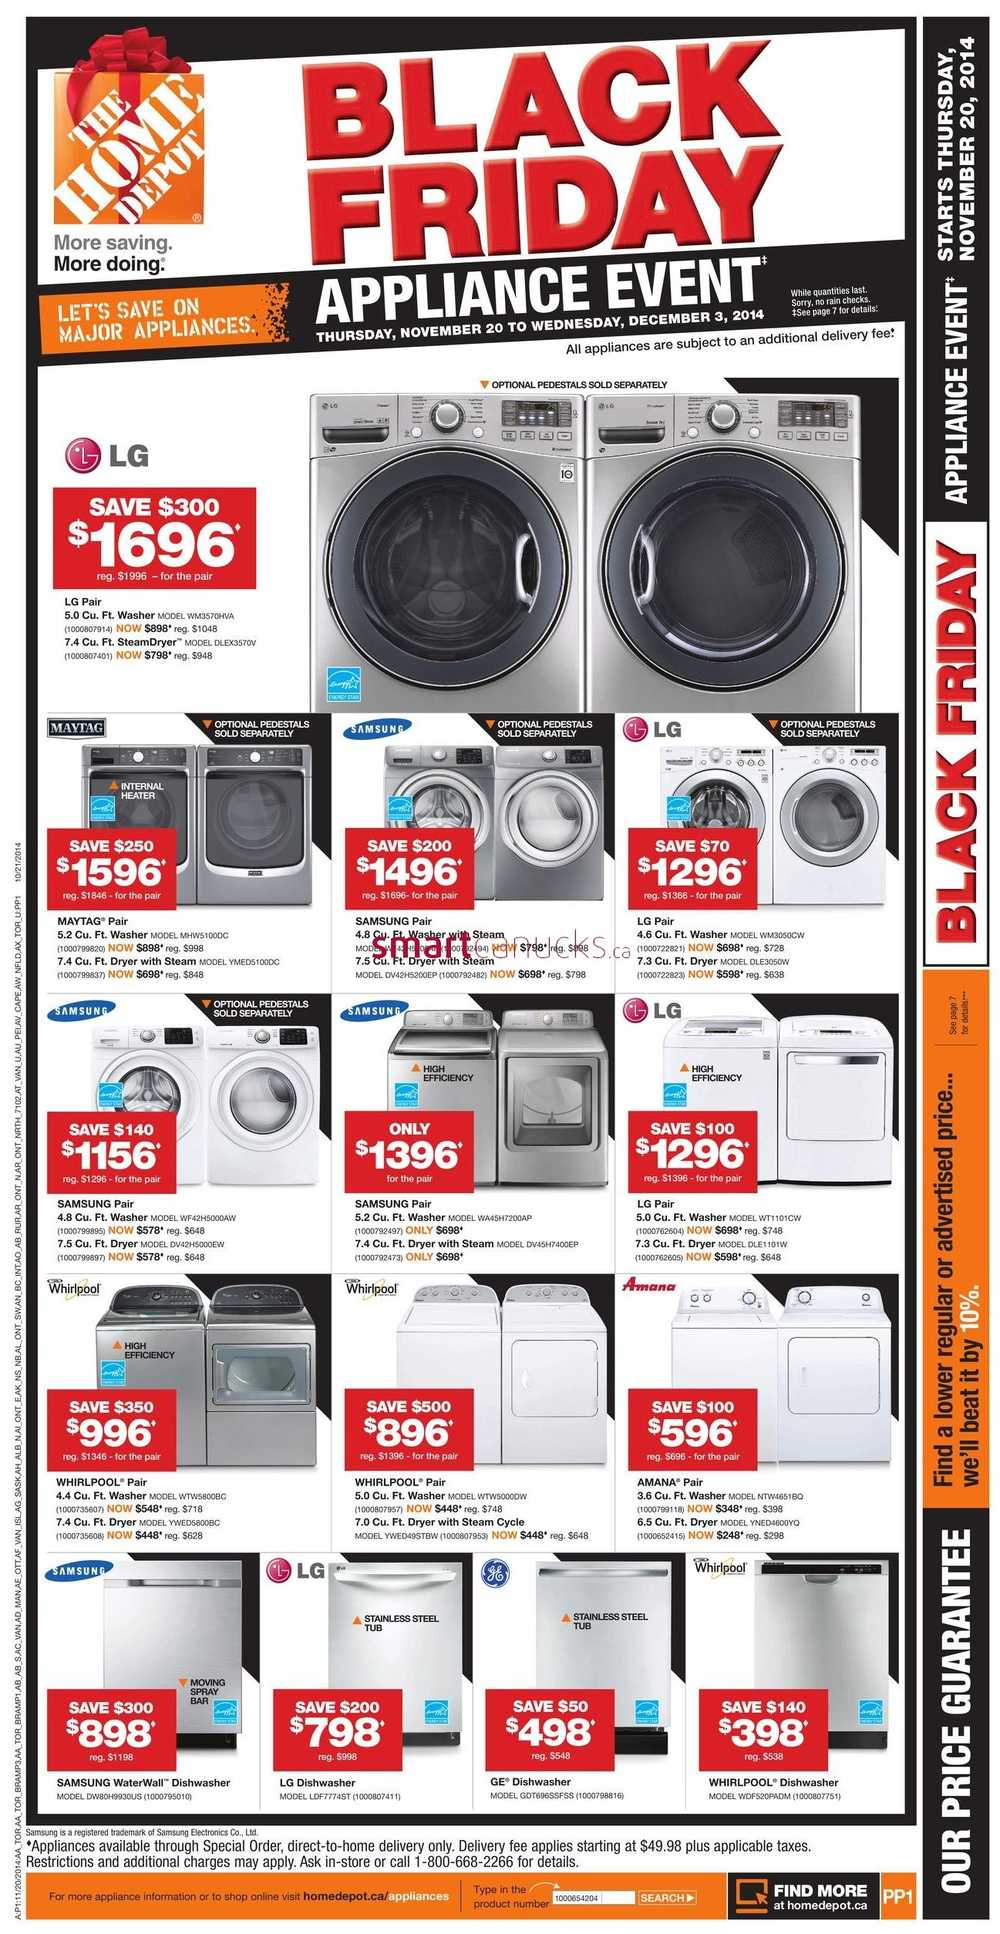 Home Depot 2014 Black Friday Appliance Event Flyer